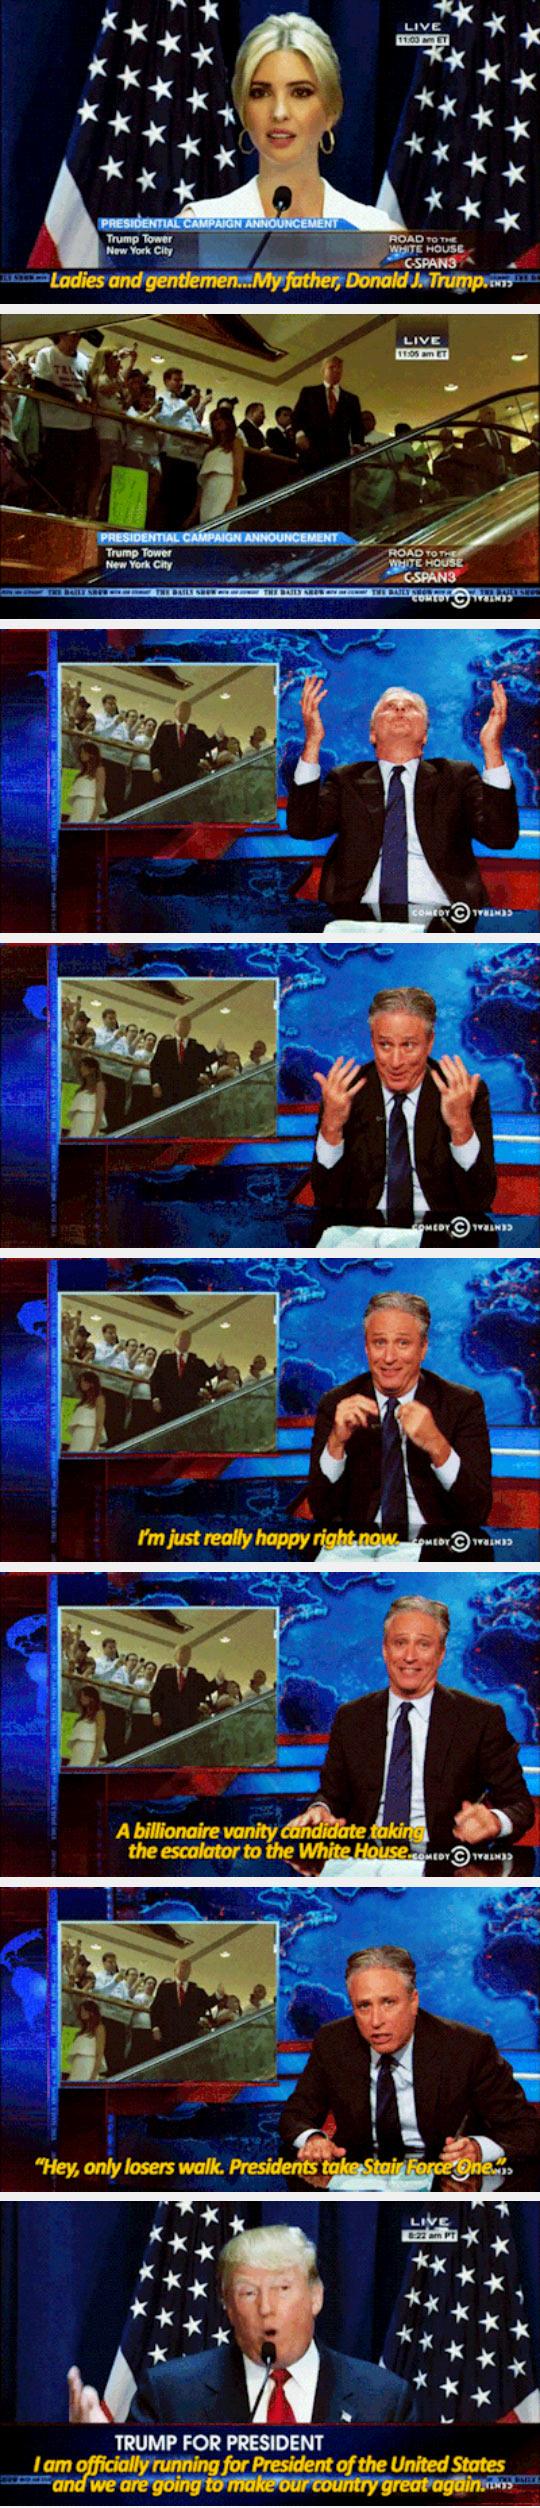 Jon Stewart Reacts To Donald Trump